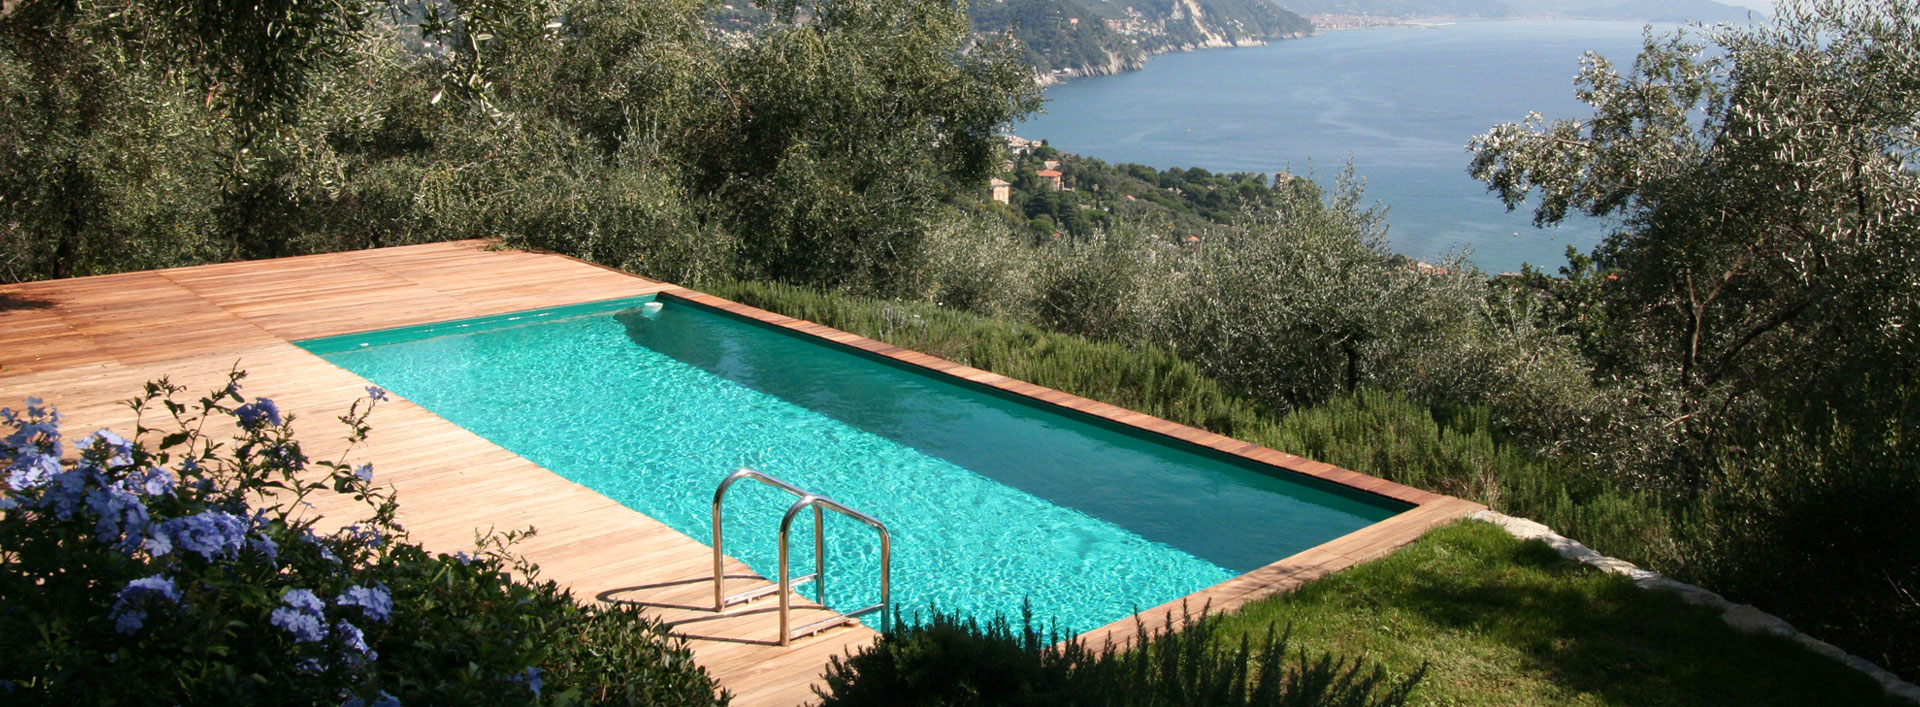 Piscine soppalcate professione piscina - Vendita piscine pescara ...